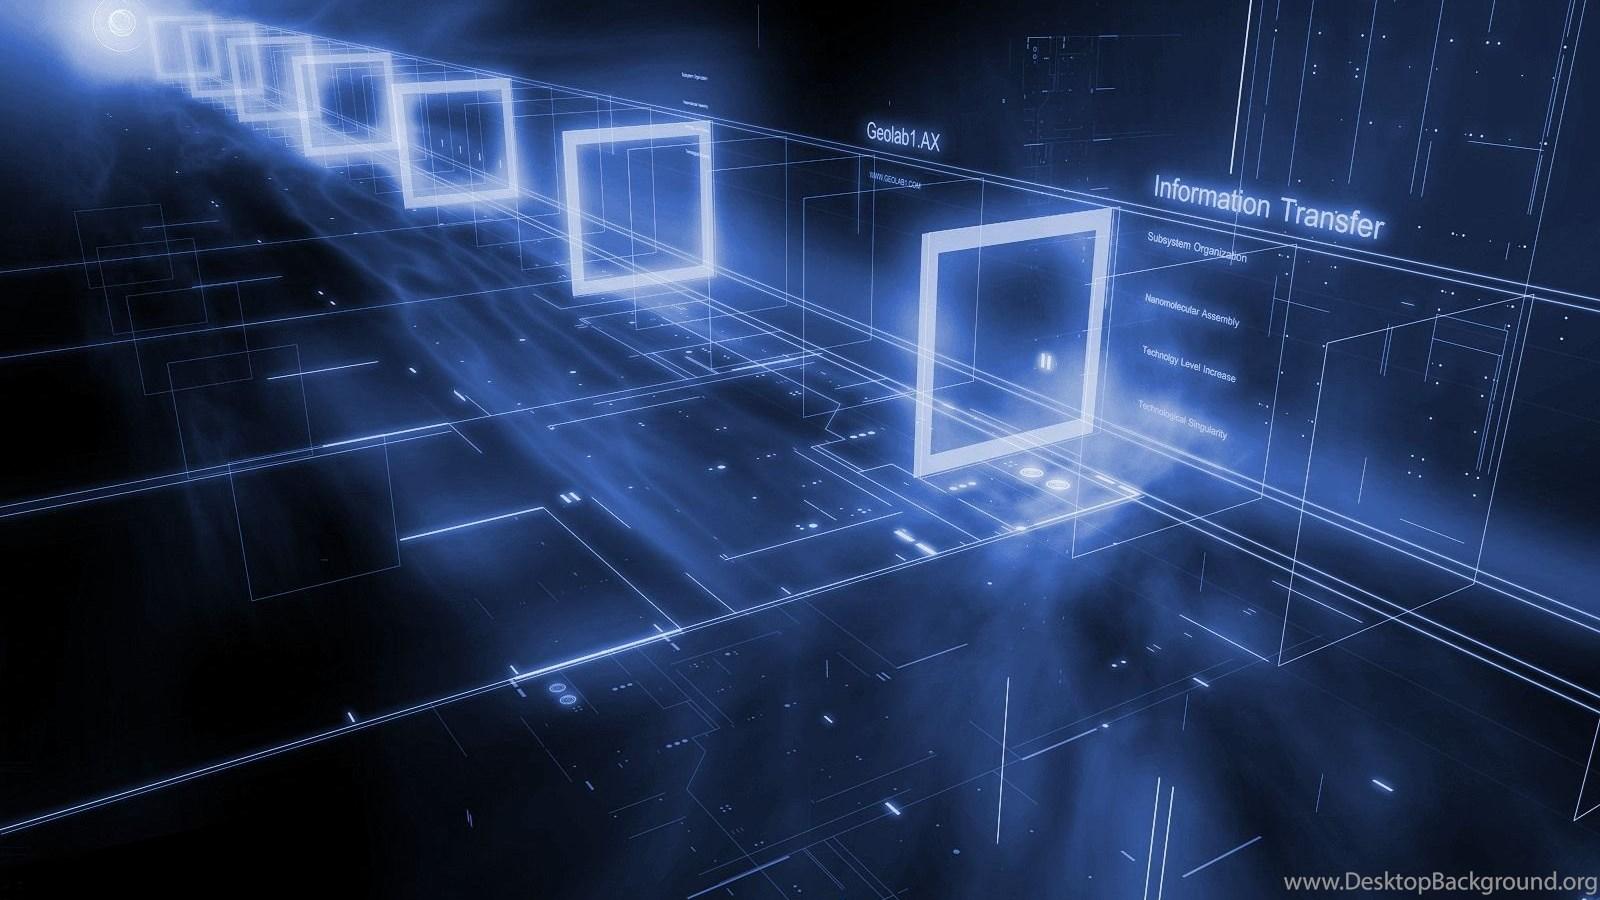 Technology cyber wallpapers 1600x1200 technology cyber - Cyber wallpaper ...